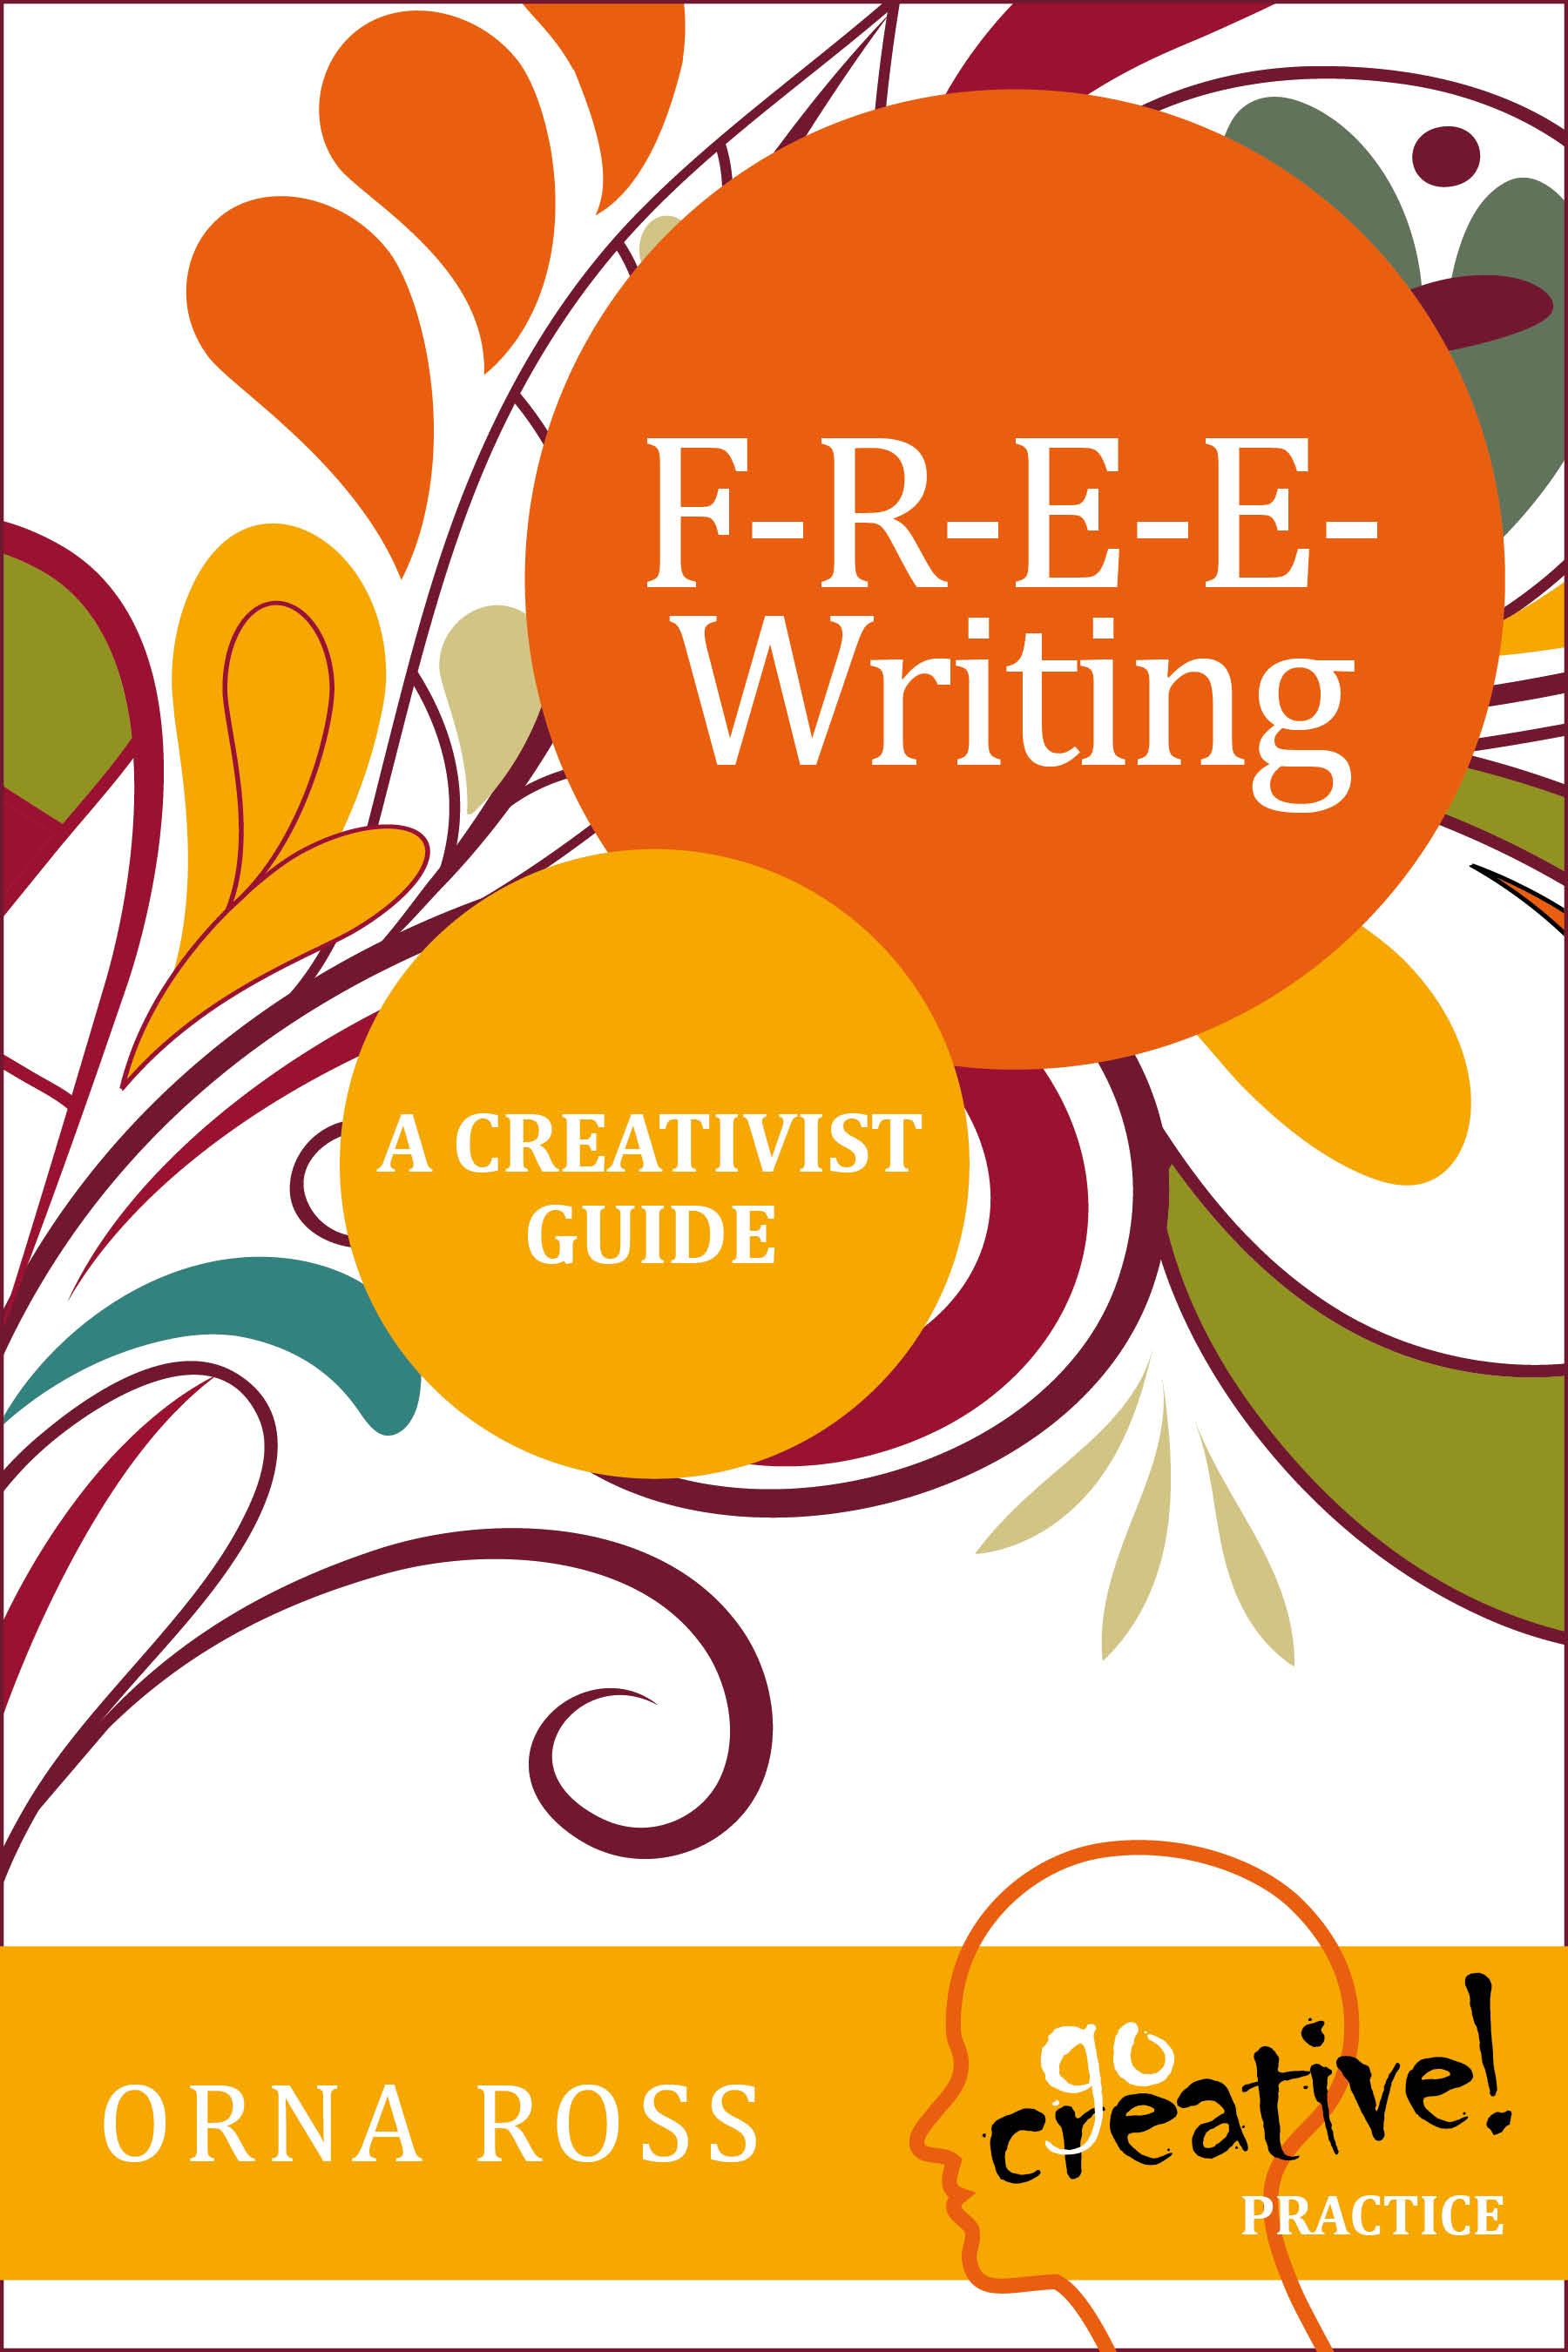 F-R-E-E-Writing: A Creativist Guide